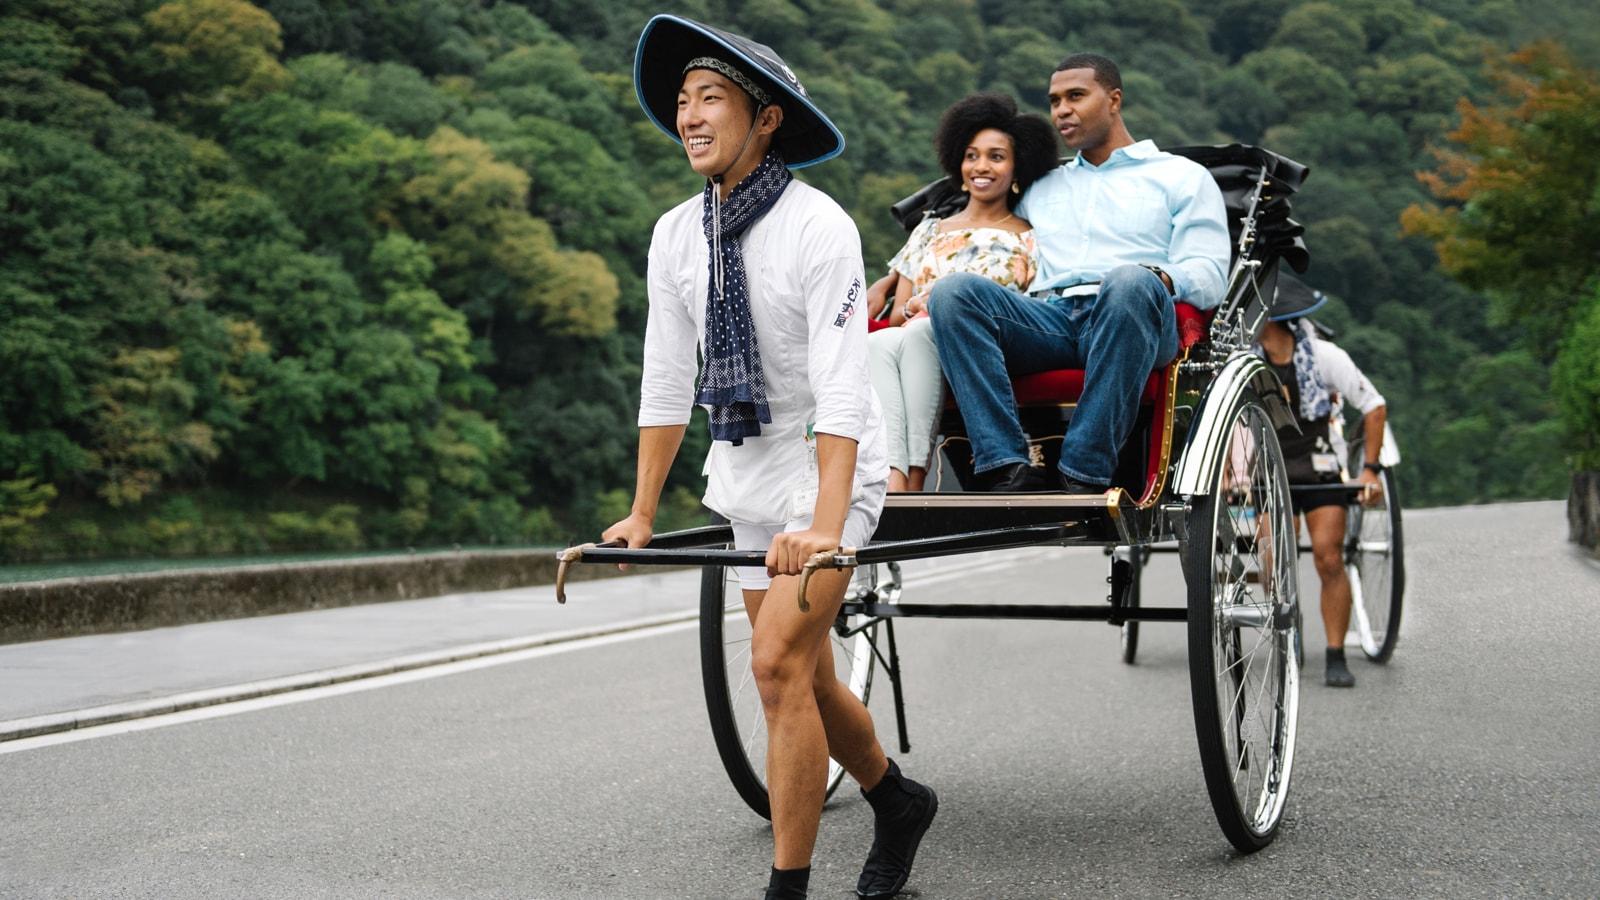 A man and woman riding in a rickshaw cart near a mountain